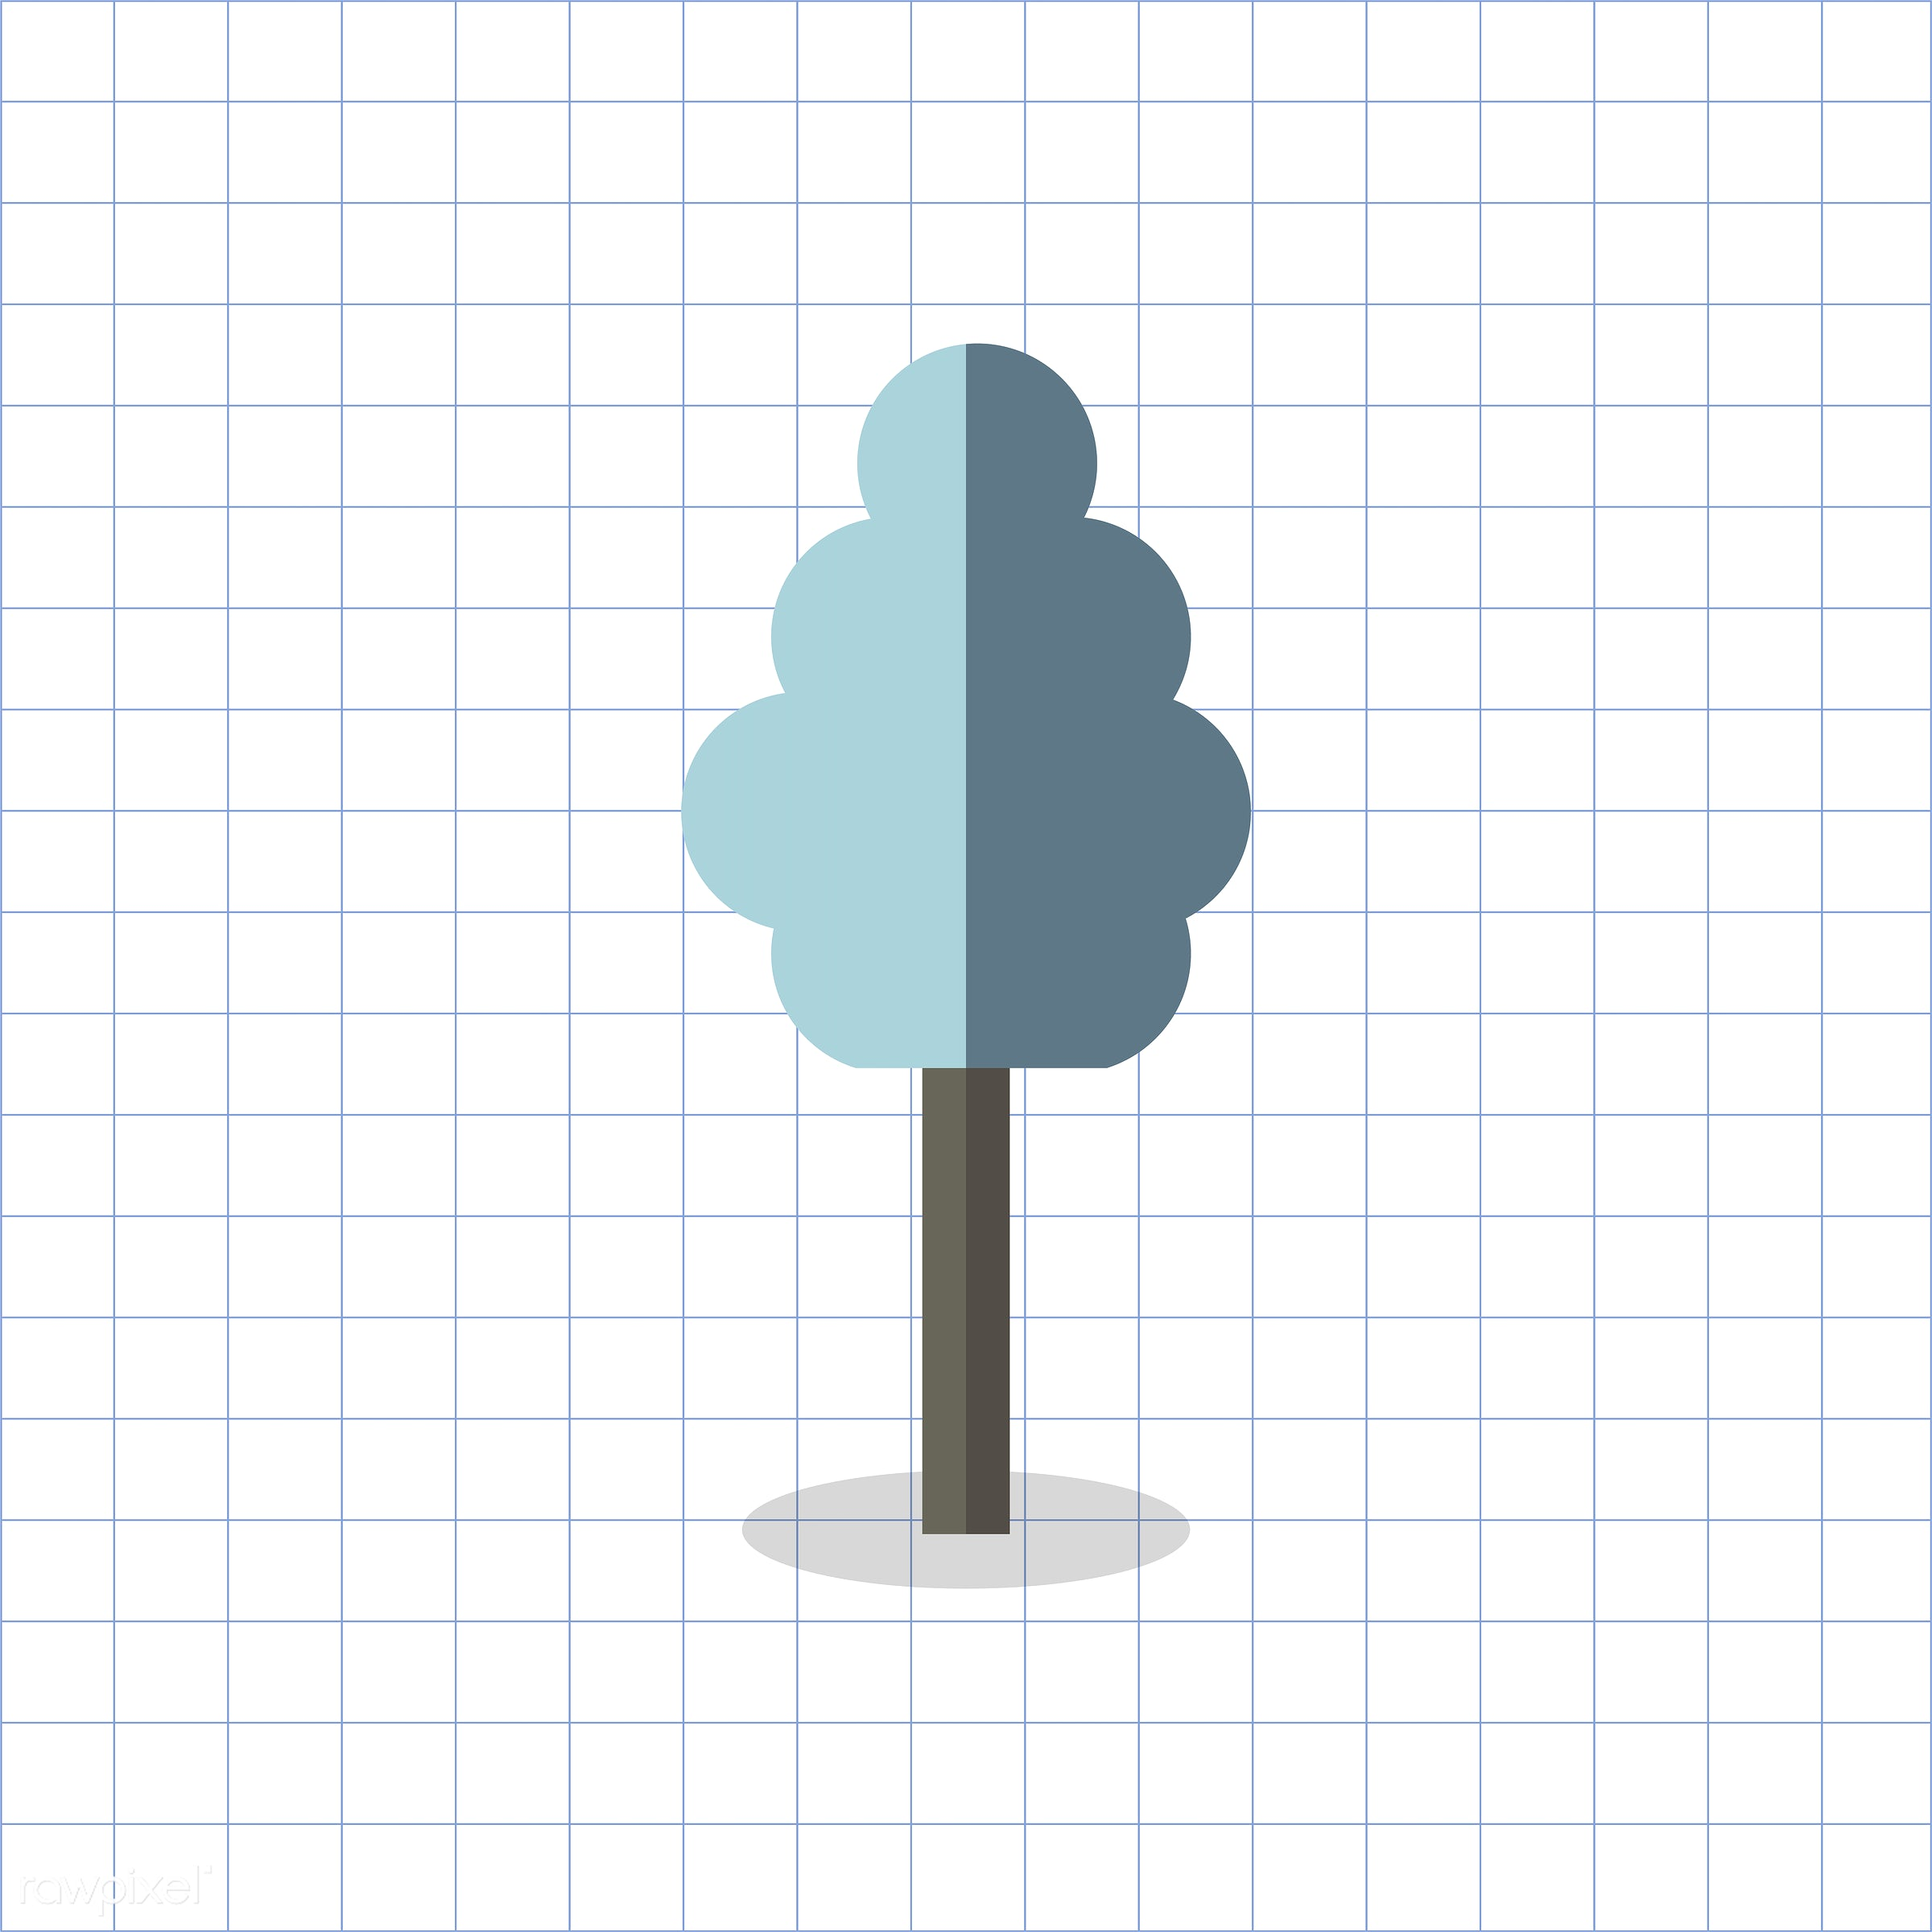 vector, graphic, illustration, icon, symbol, colorful, cute, plant, tree, nature, blue